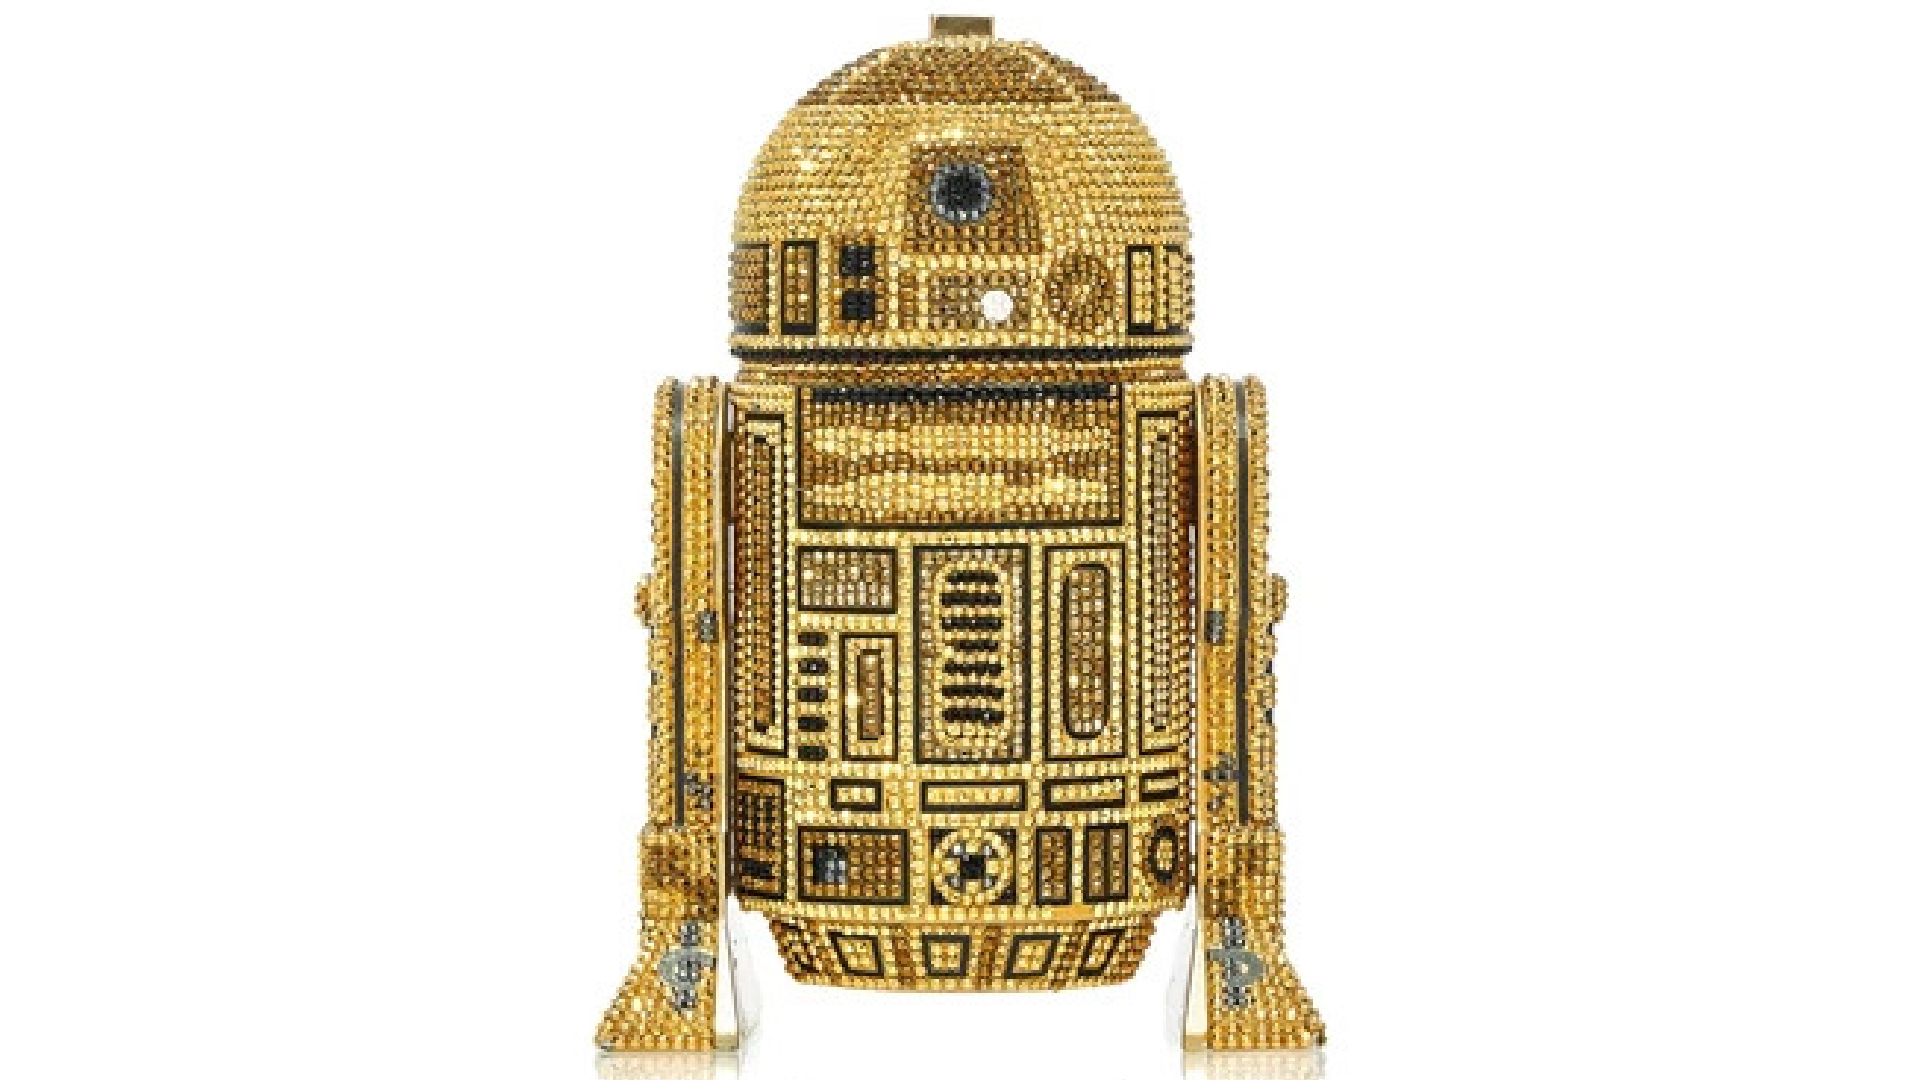 Star Wars, Judith Leiber, R2-D2